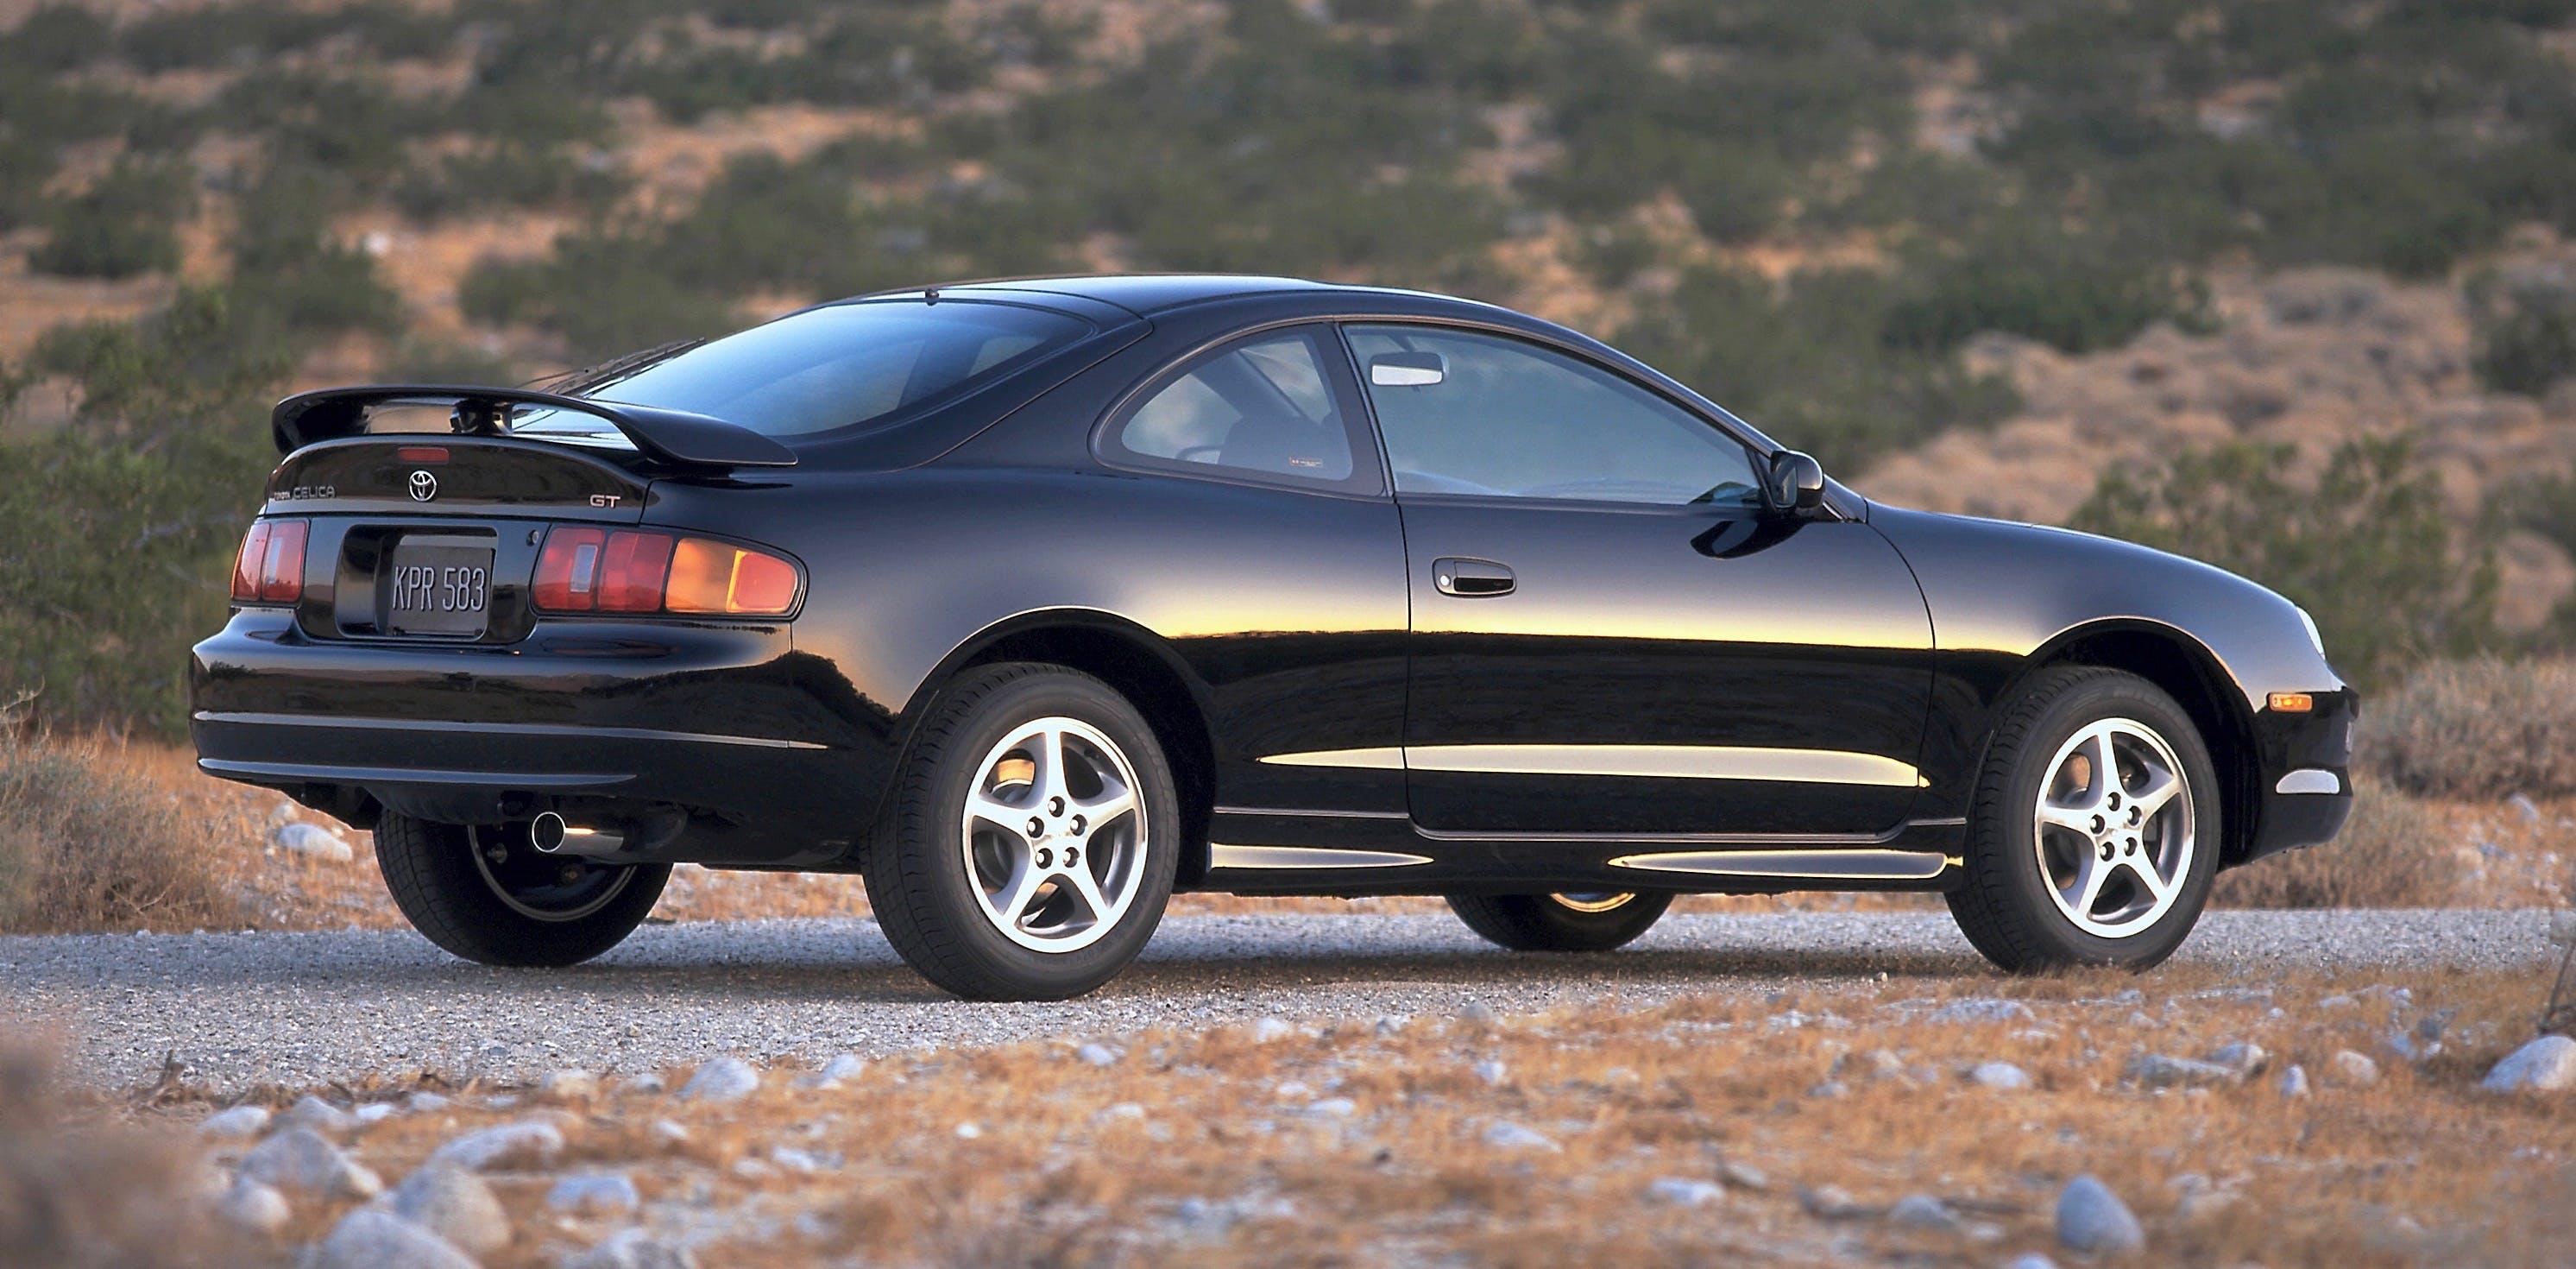 Car Recall: Late '90s Toyota Supra, RAV4, Celica for New Takata Airbag Issue